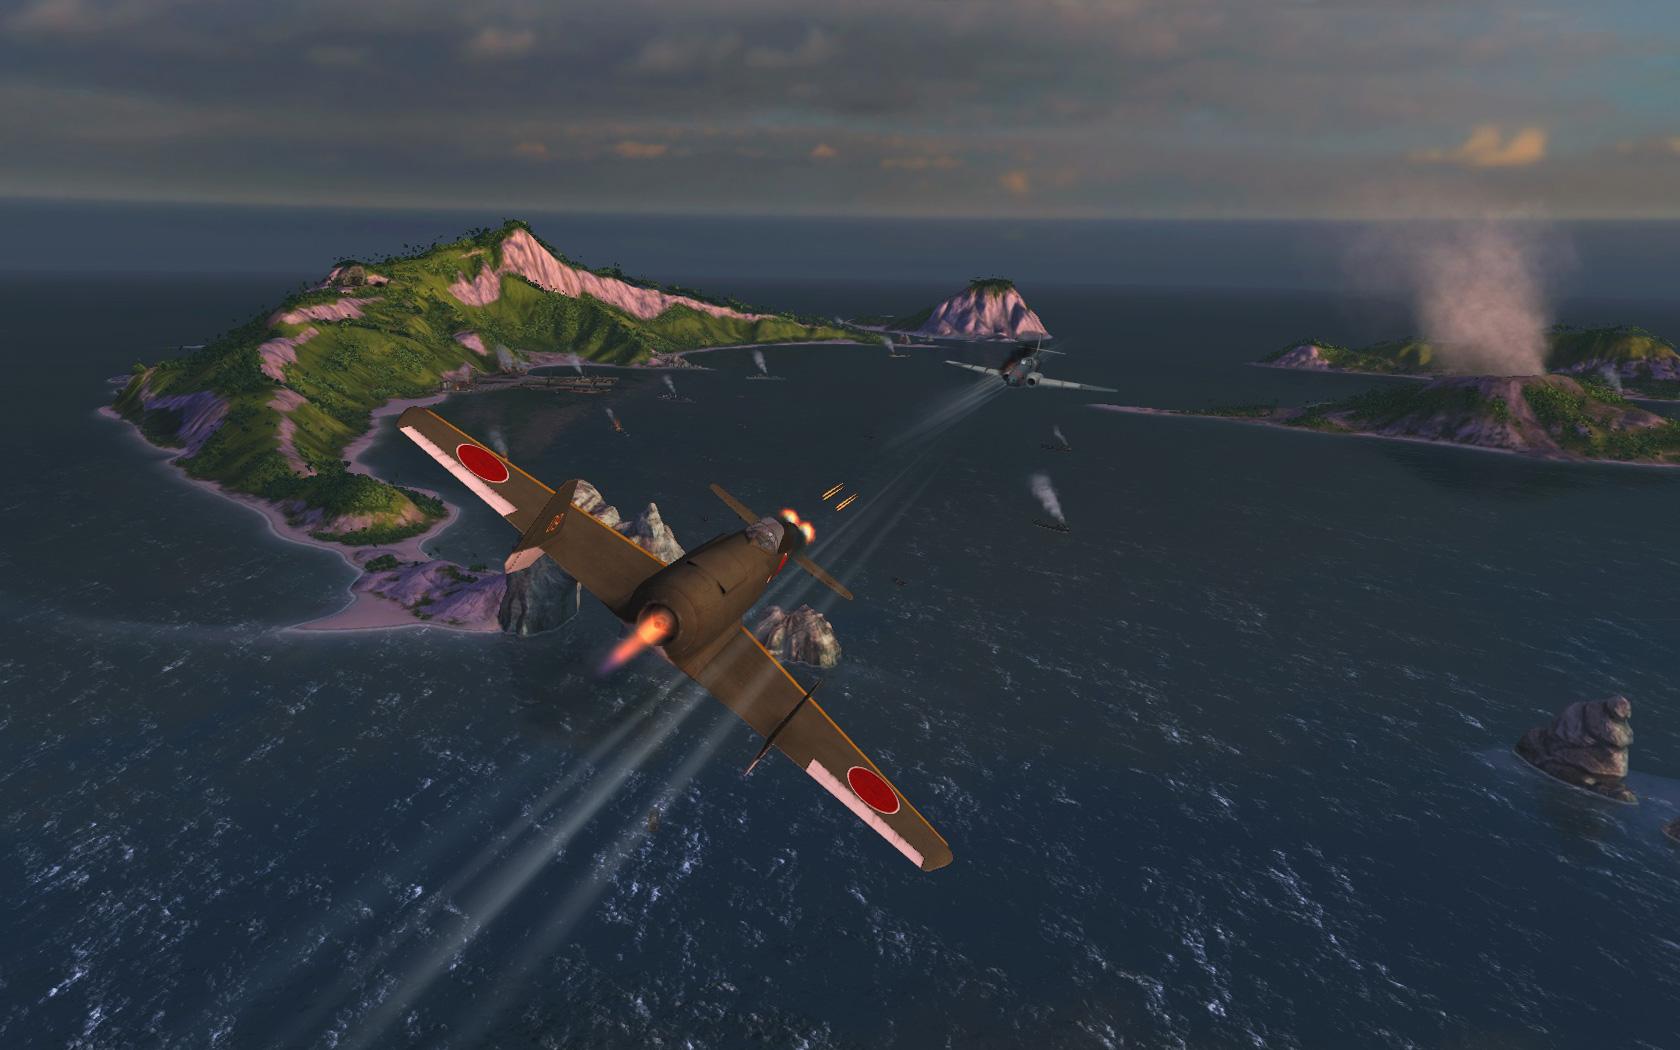 world_of_warplanes_screens_image_02.jpg